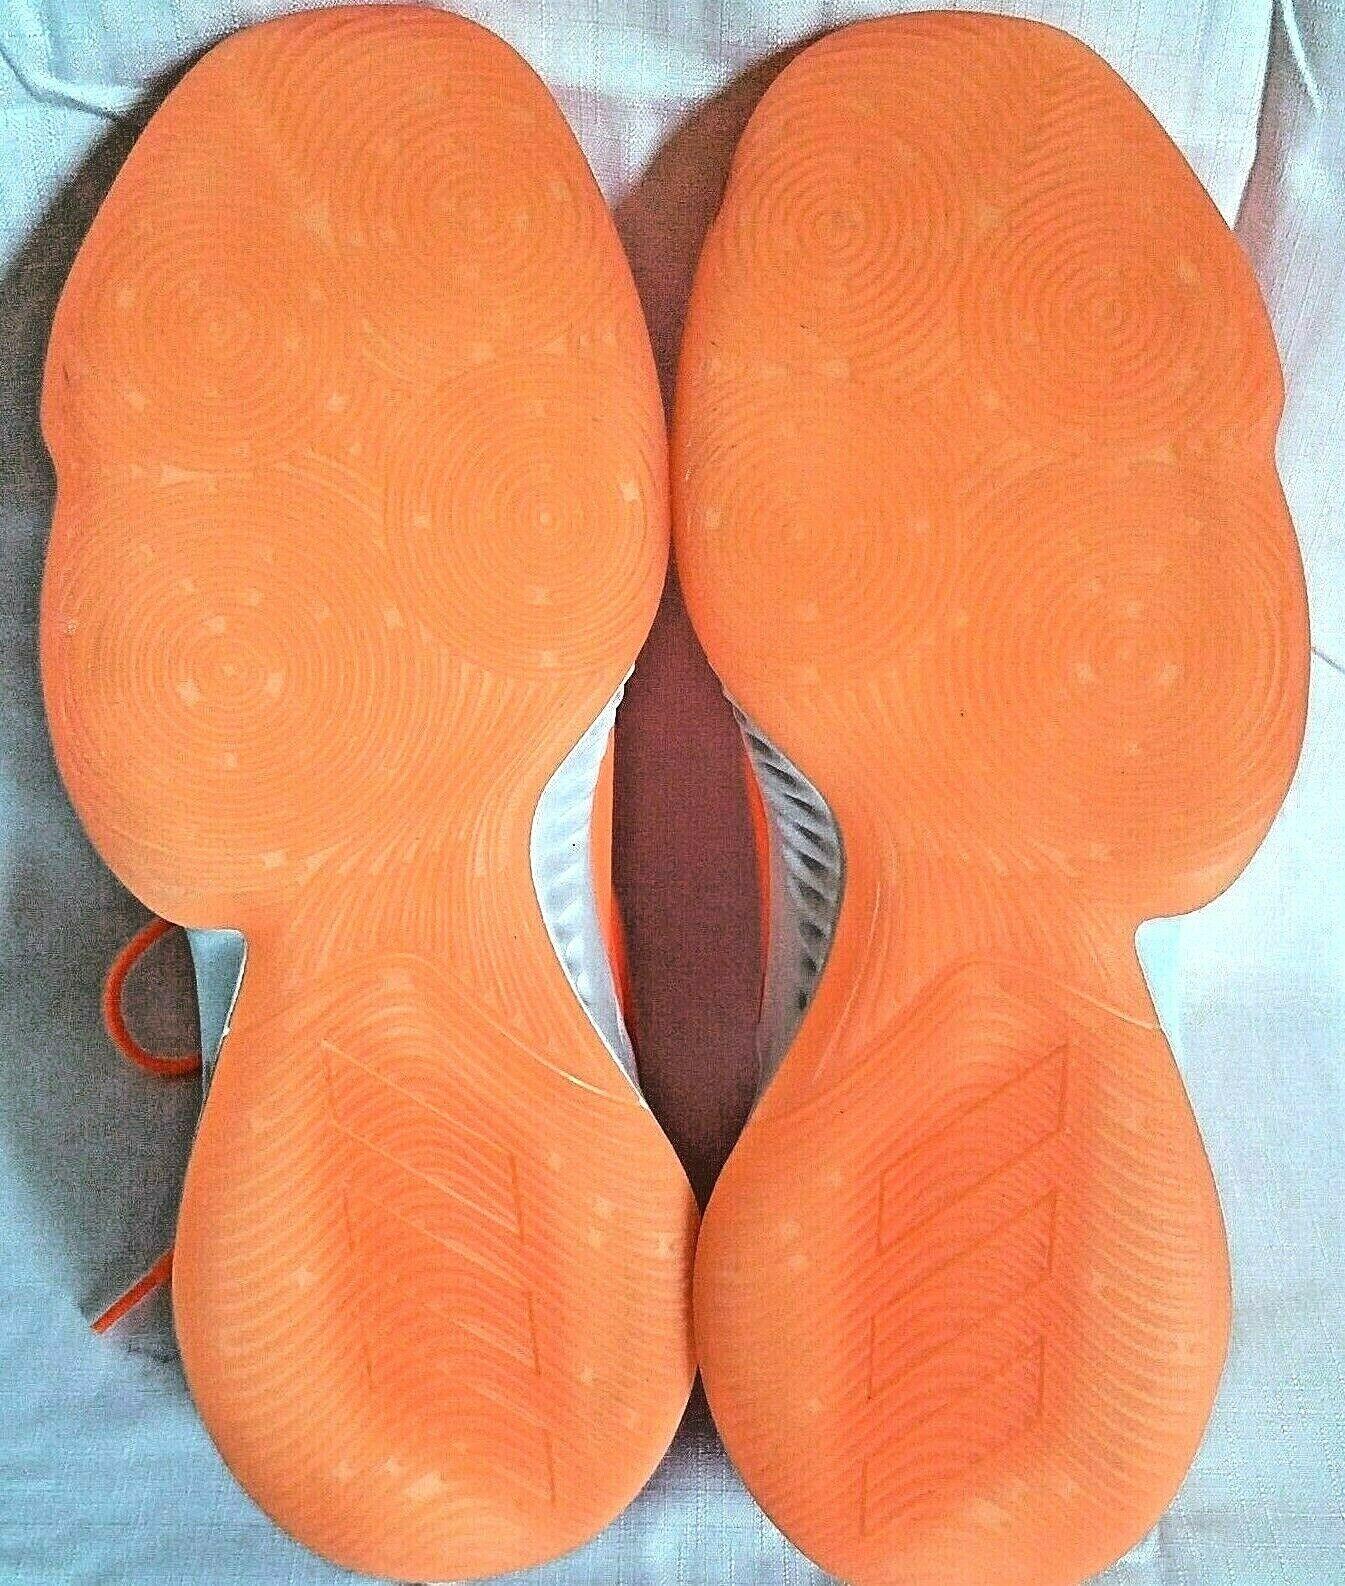 adidas SM Mad Bounce Mens 12.5 D97371 Basketball Shoes Orange & White 2018 image 9